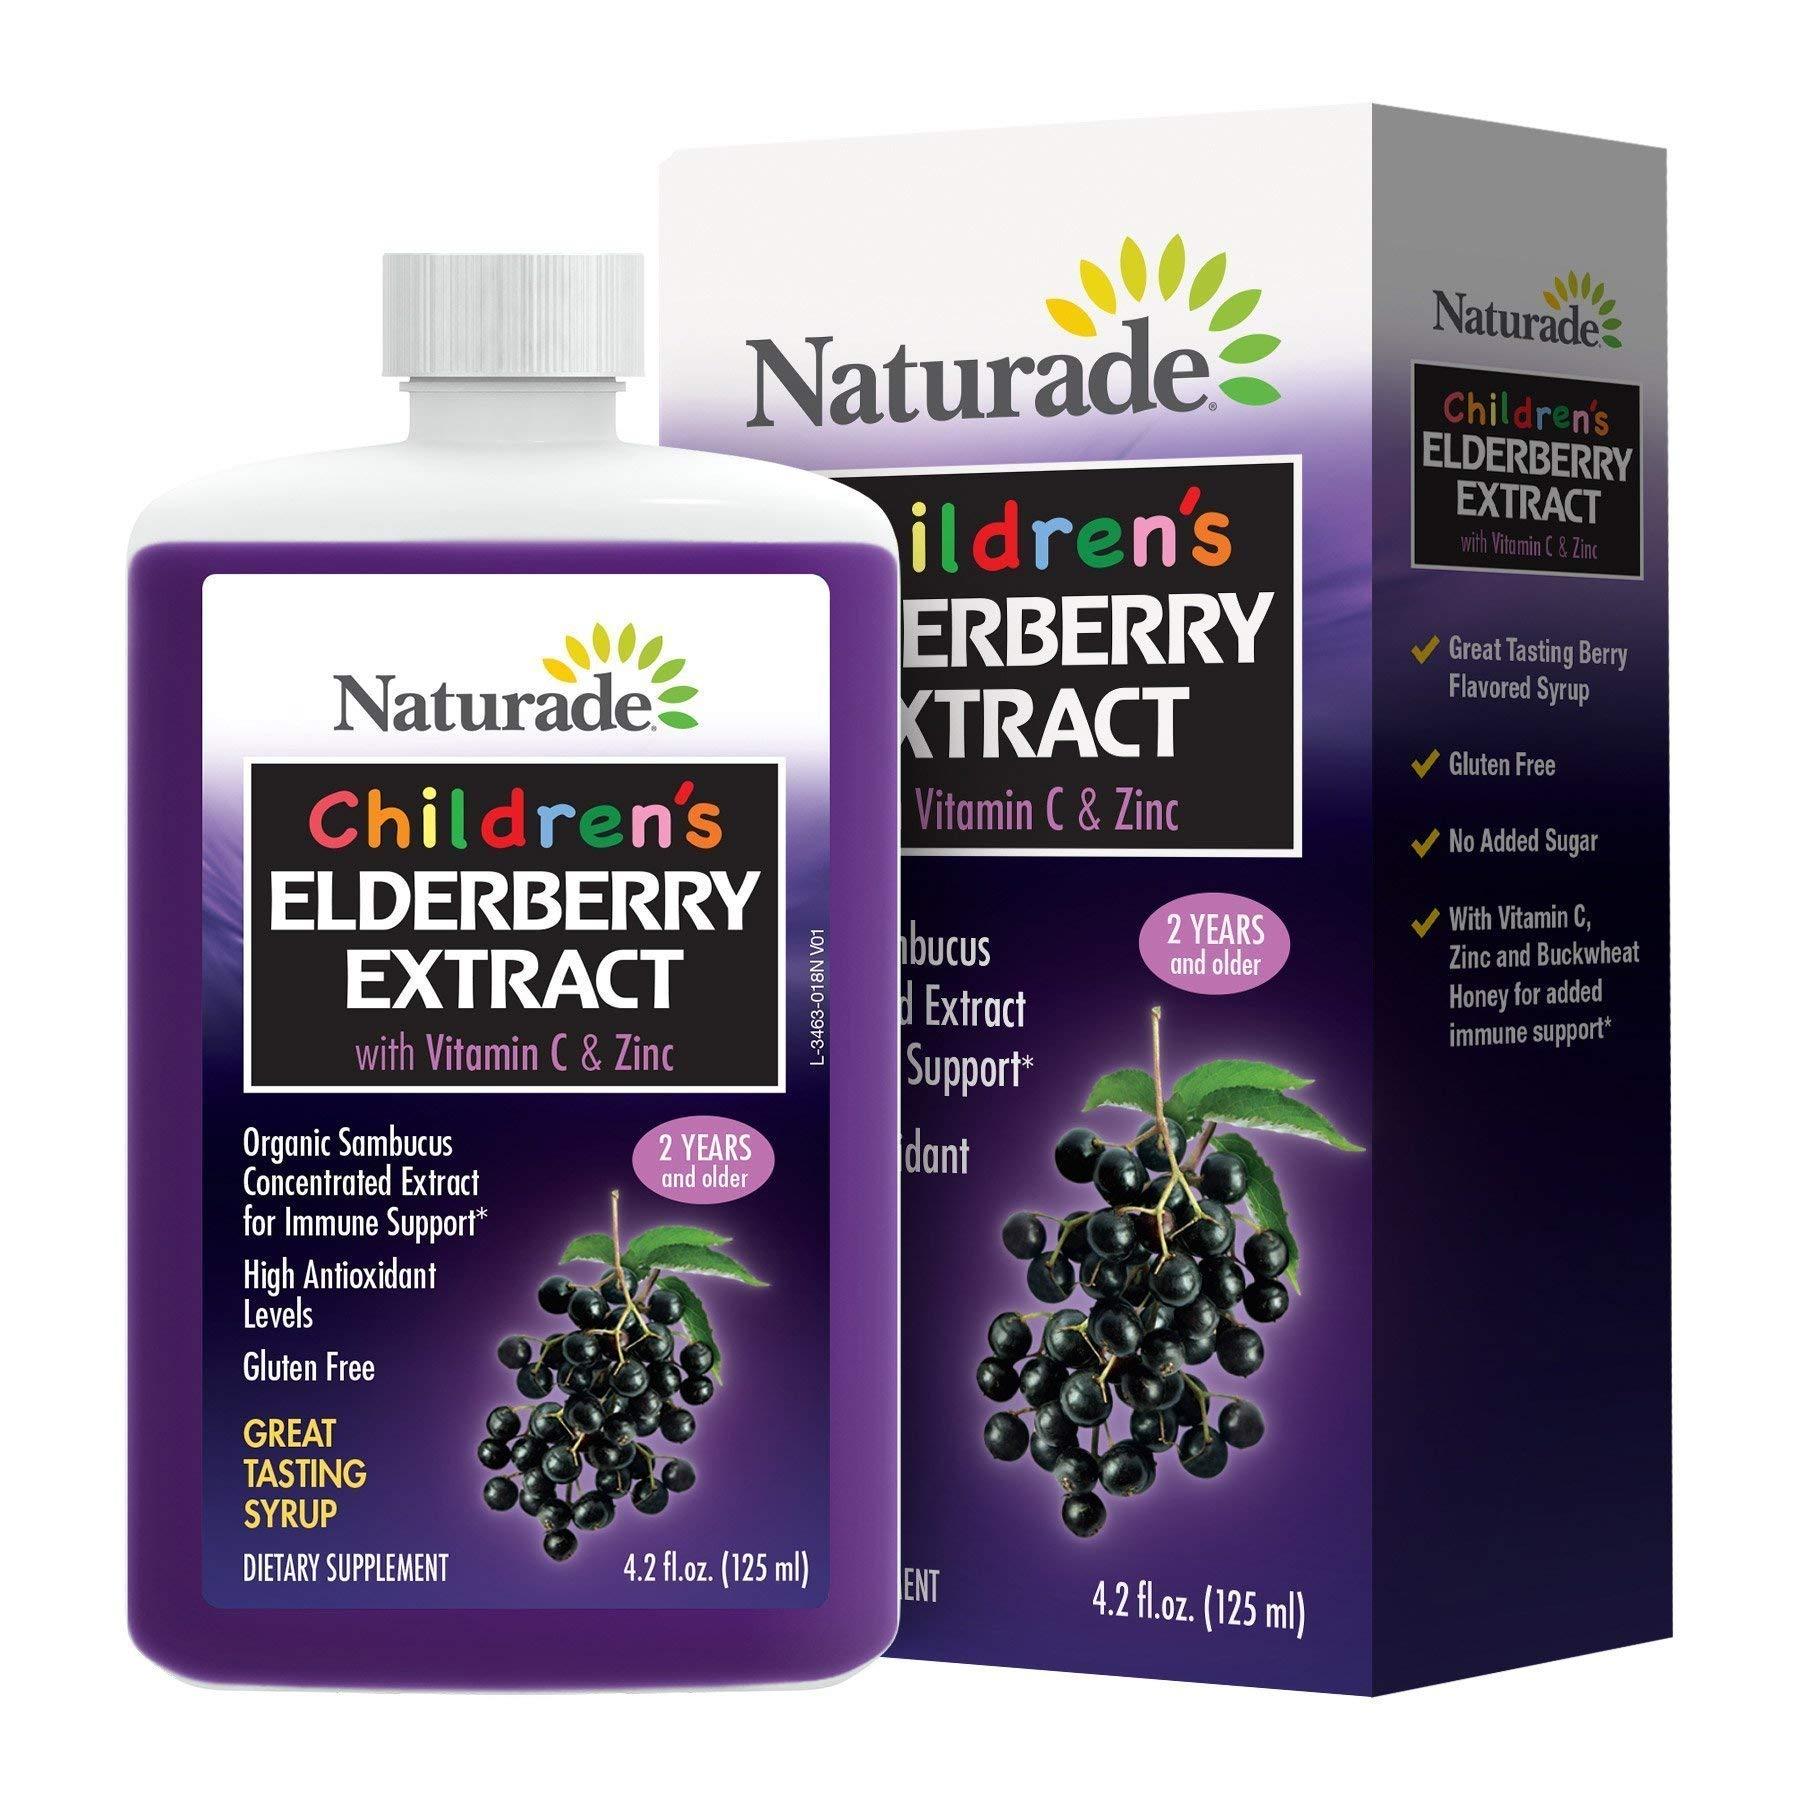 Naturade Children's Elderberry Extract Syrup with Vitamin C & Zinc, 4.2 fl oz (125 ml)